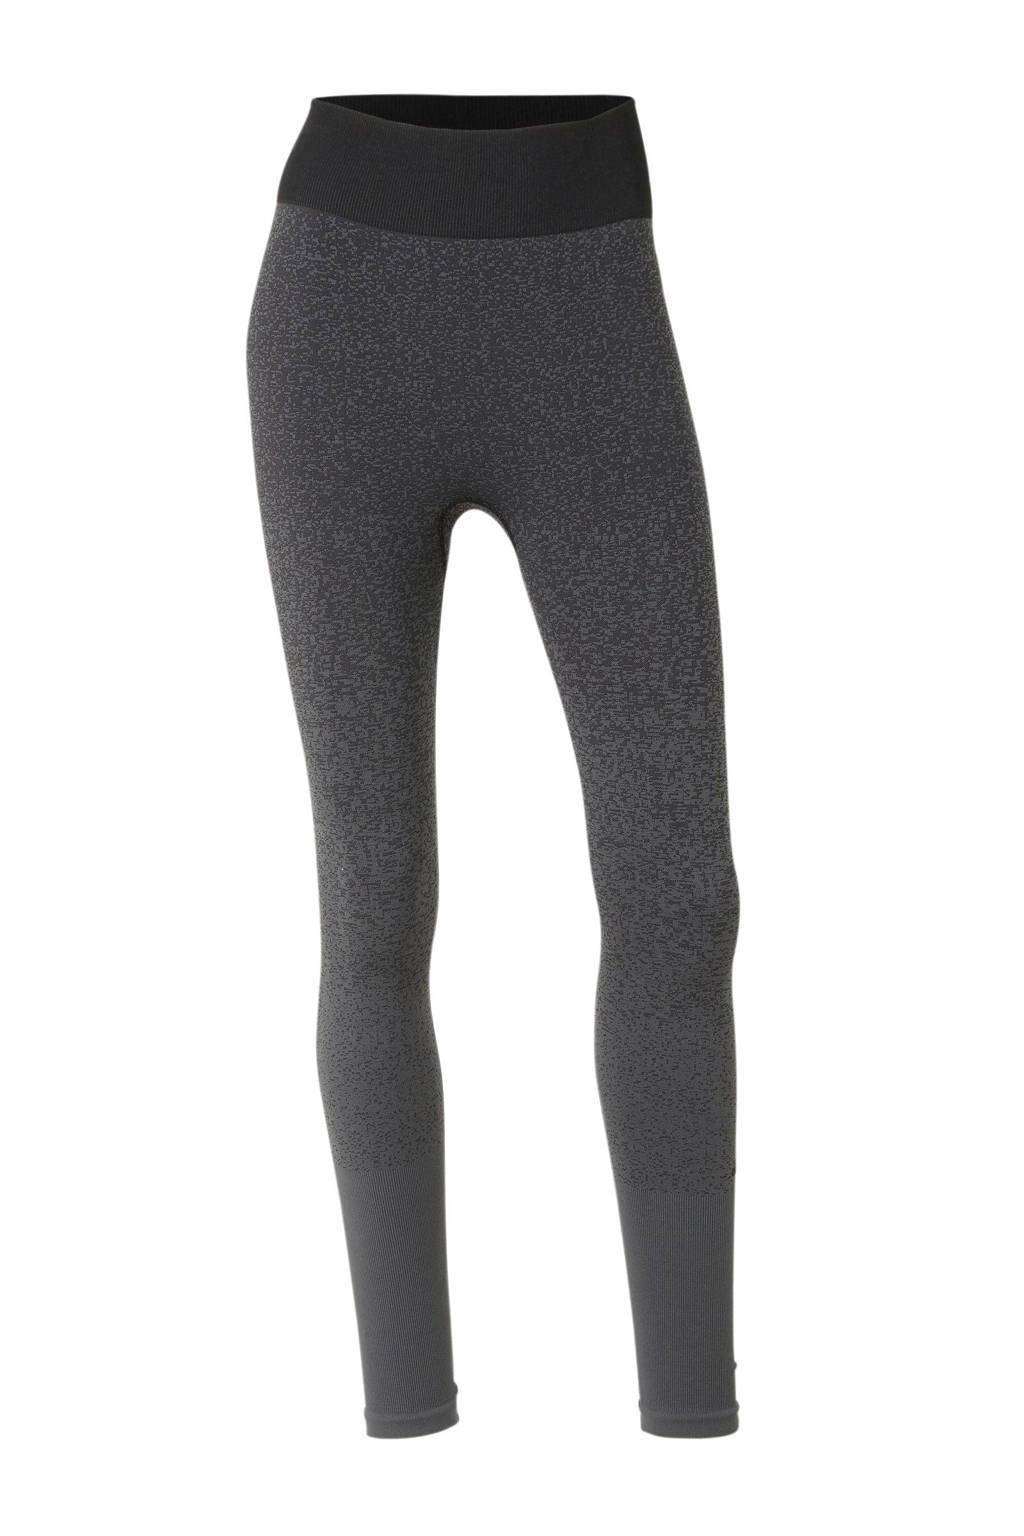 adidas performance sportbroek zwart/grijs, Zwart